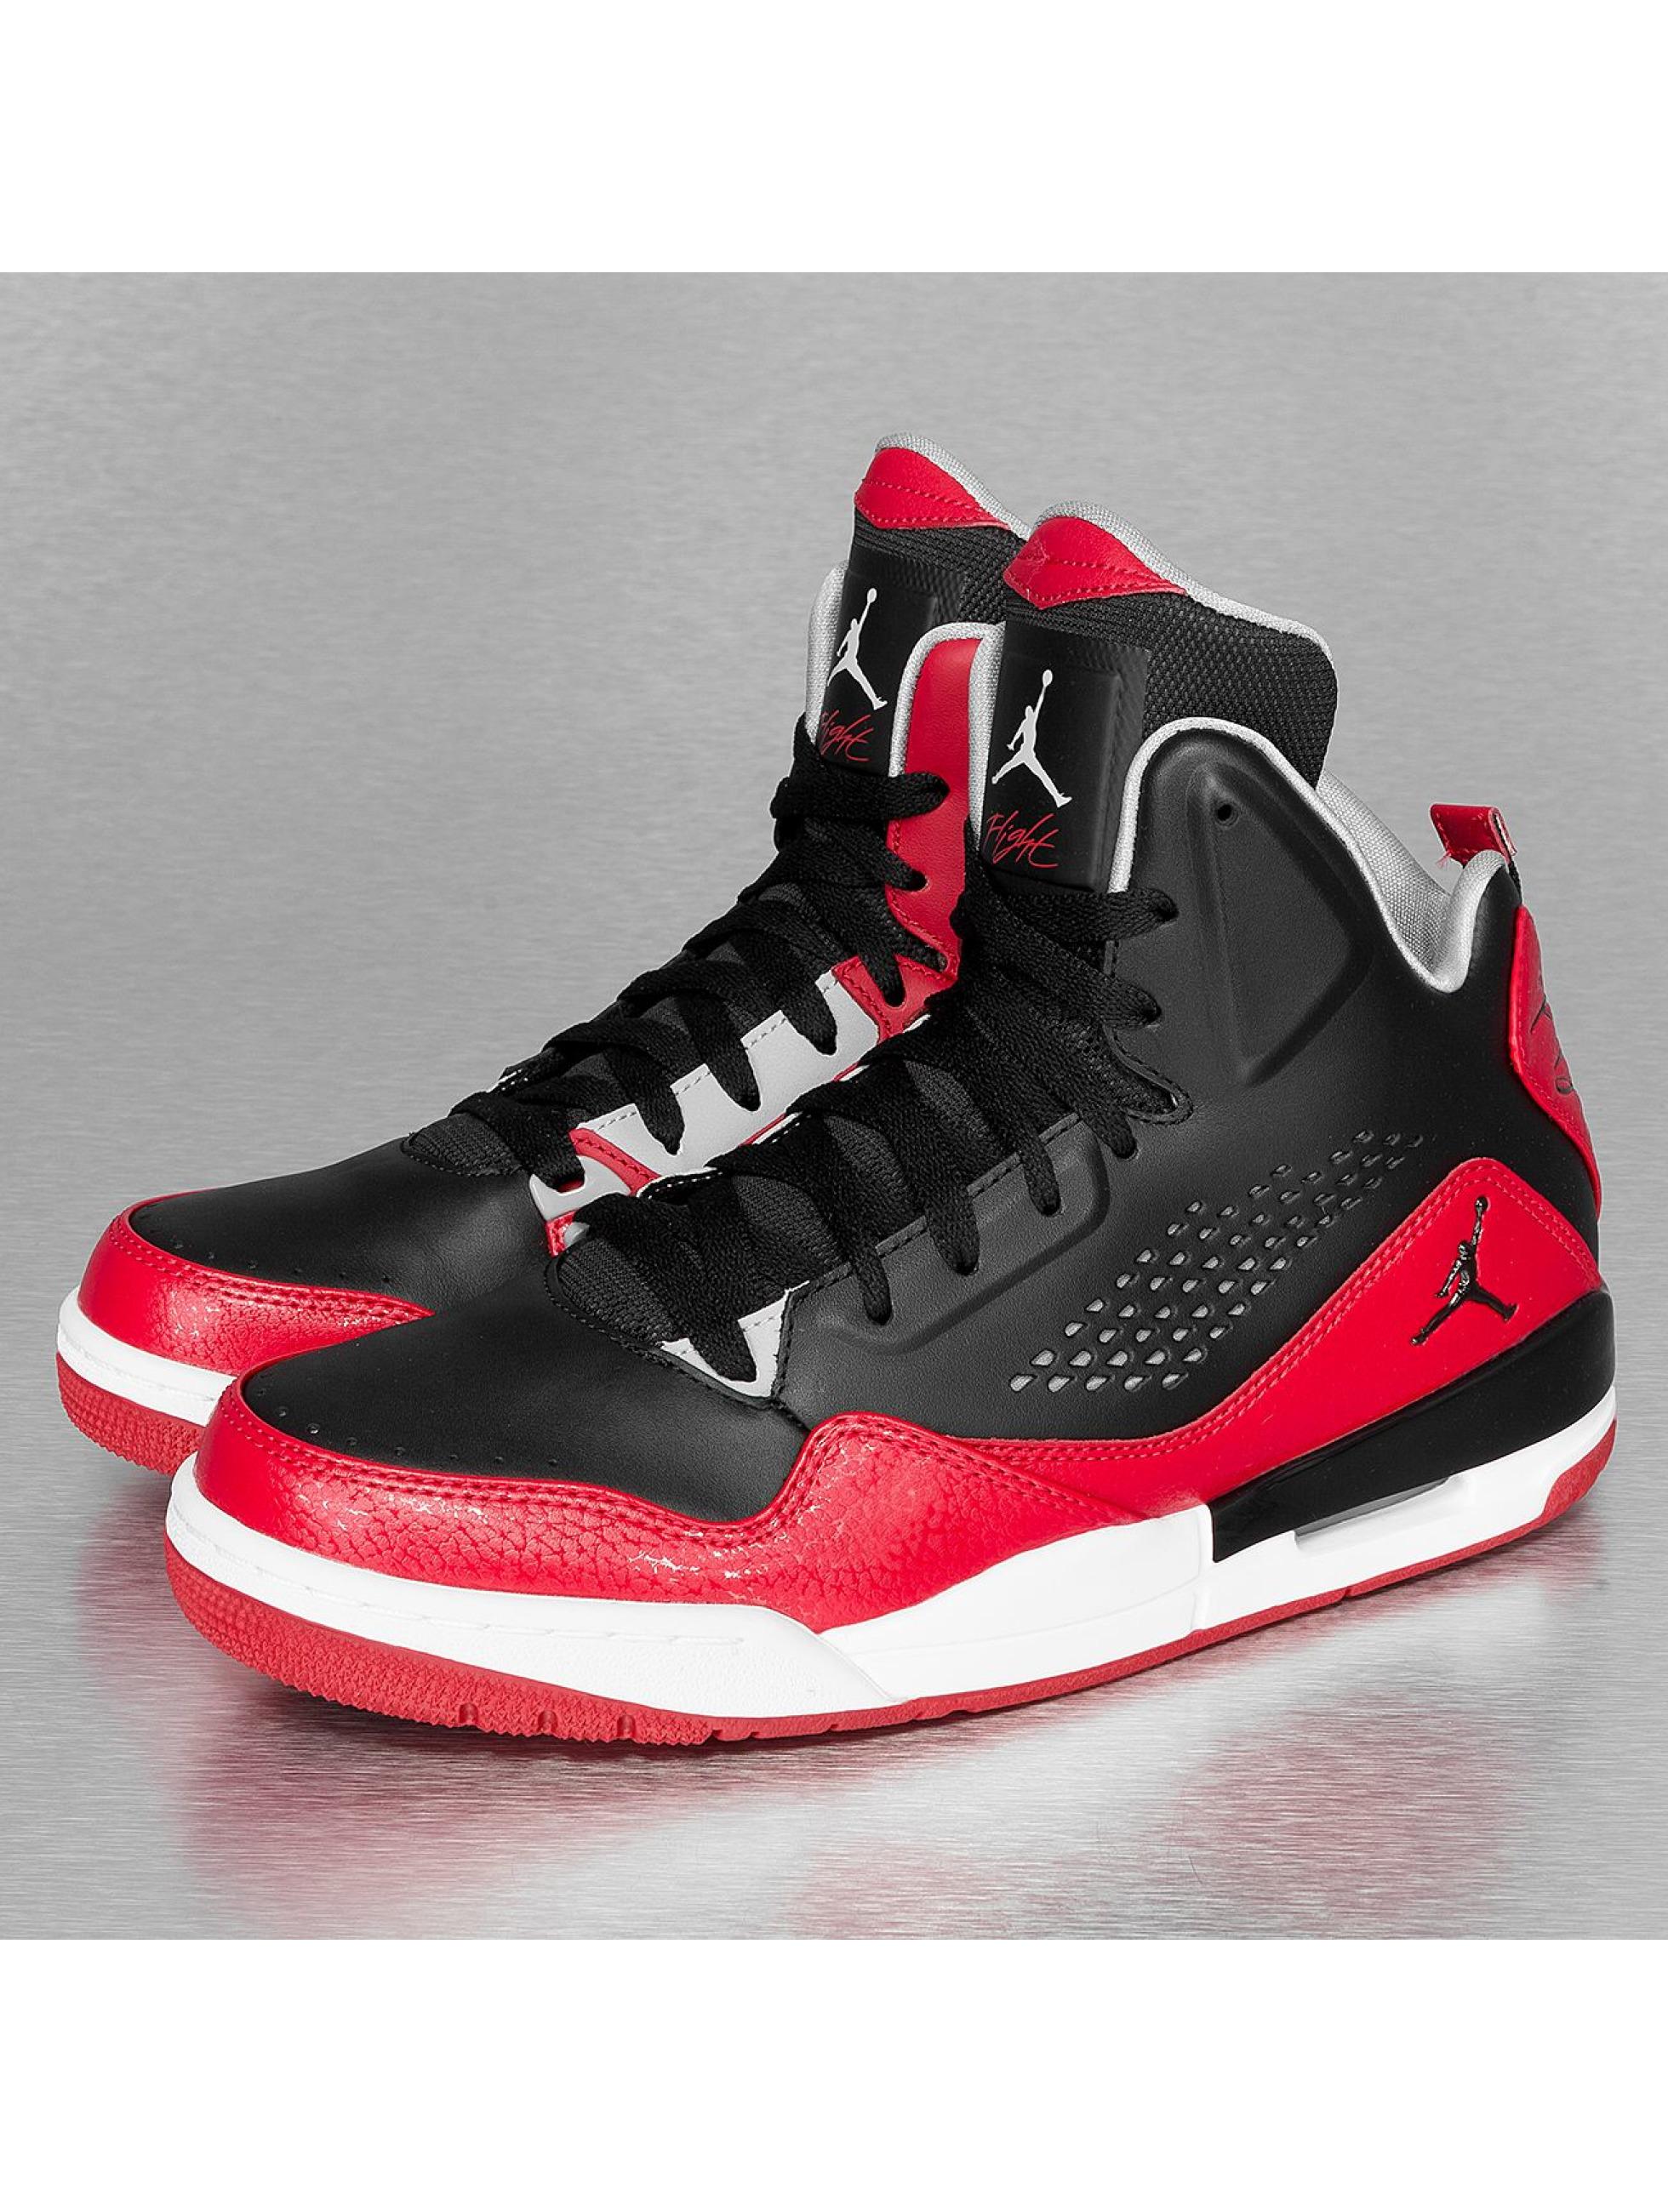 Gimnasio Baños Jordan:Jordan Zapato / Zapatillas de deporte SC-3 Basketball en negro